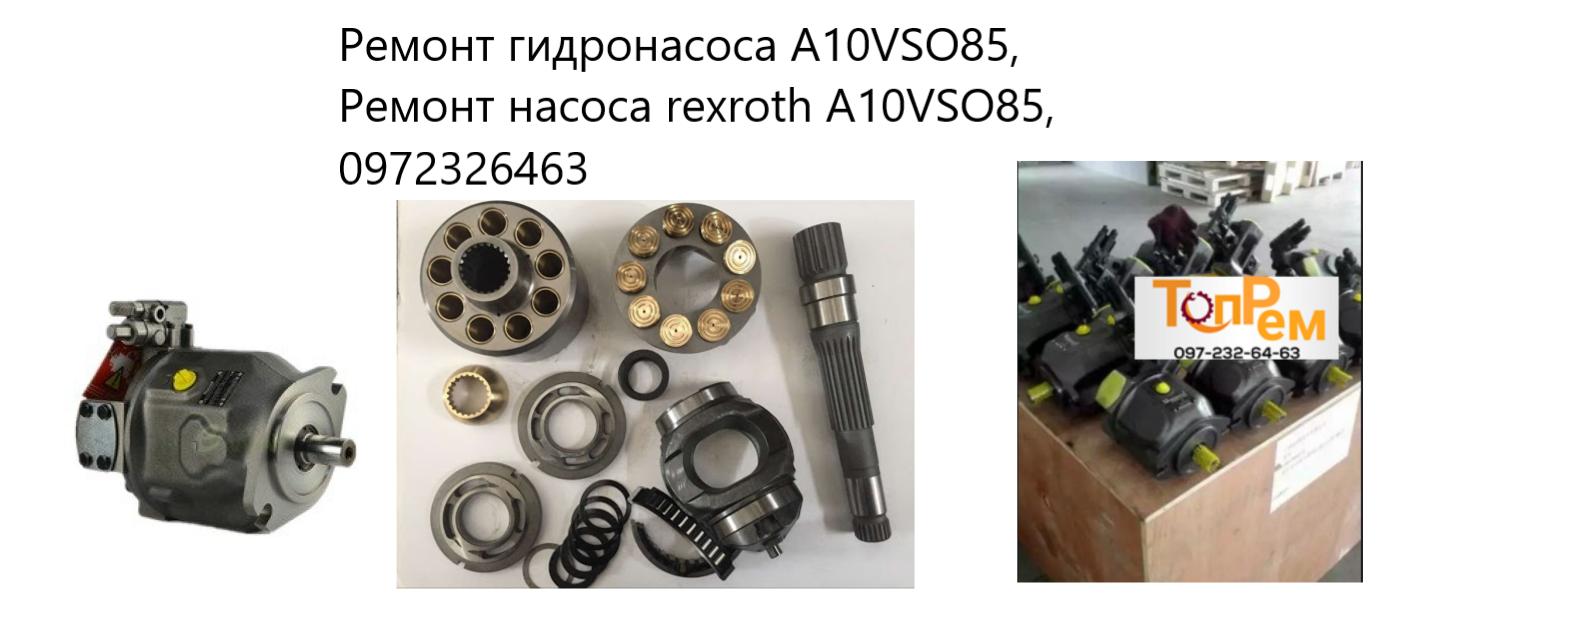 Ремонт гидронасоса A10VSO85